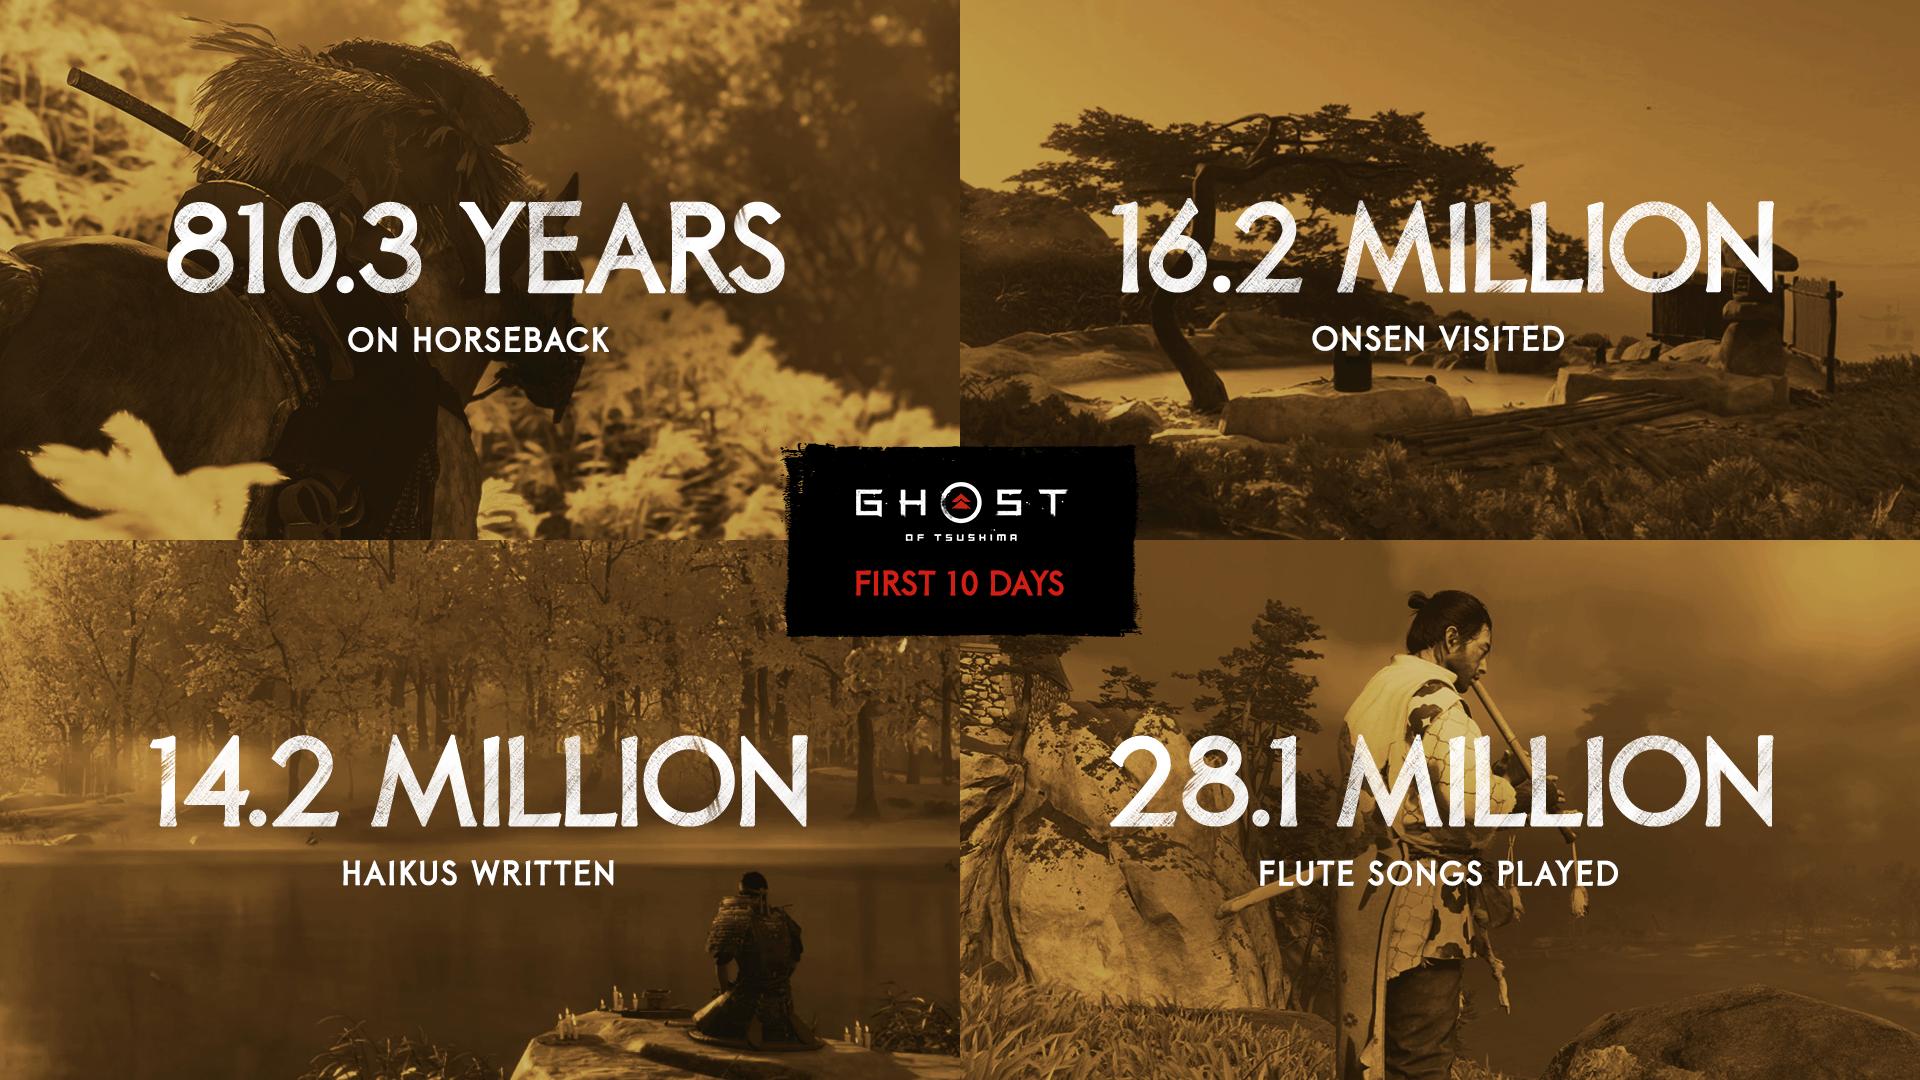 Игроки погладили 8.8 миллионов лисичек — статистика Ghost of Tsushima